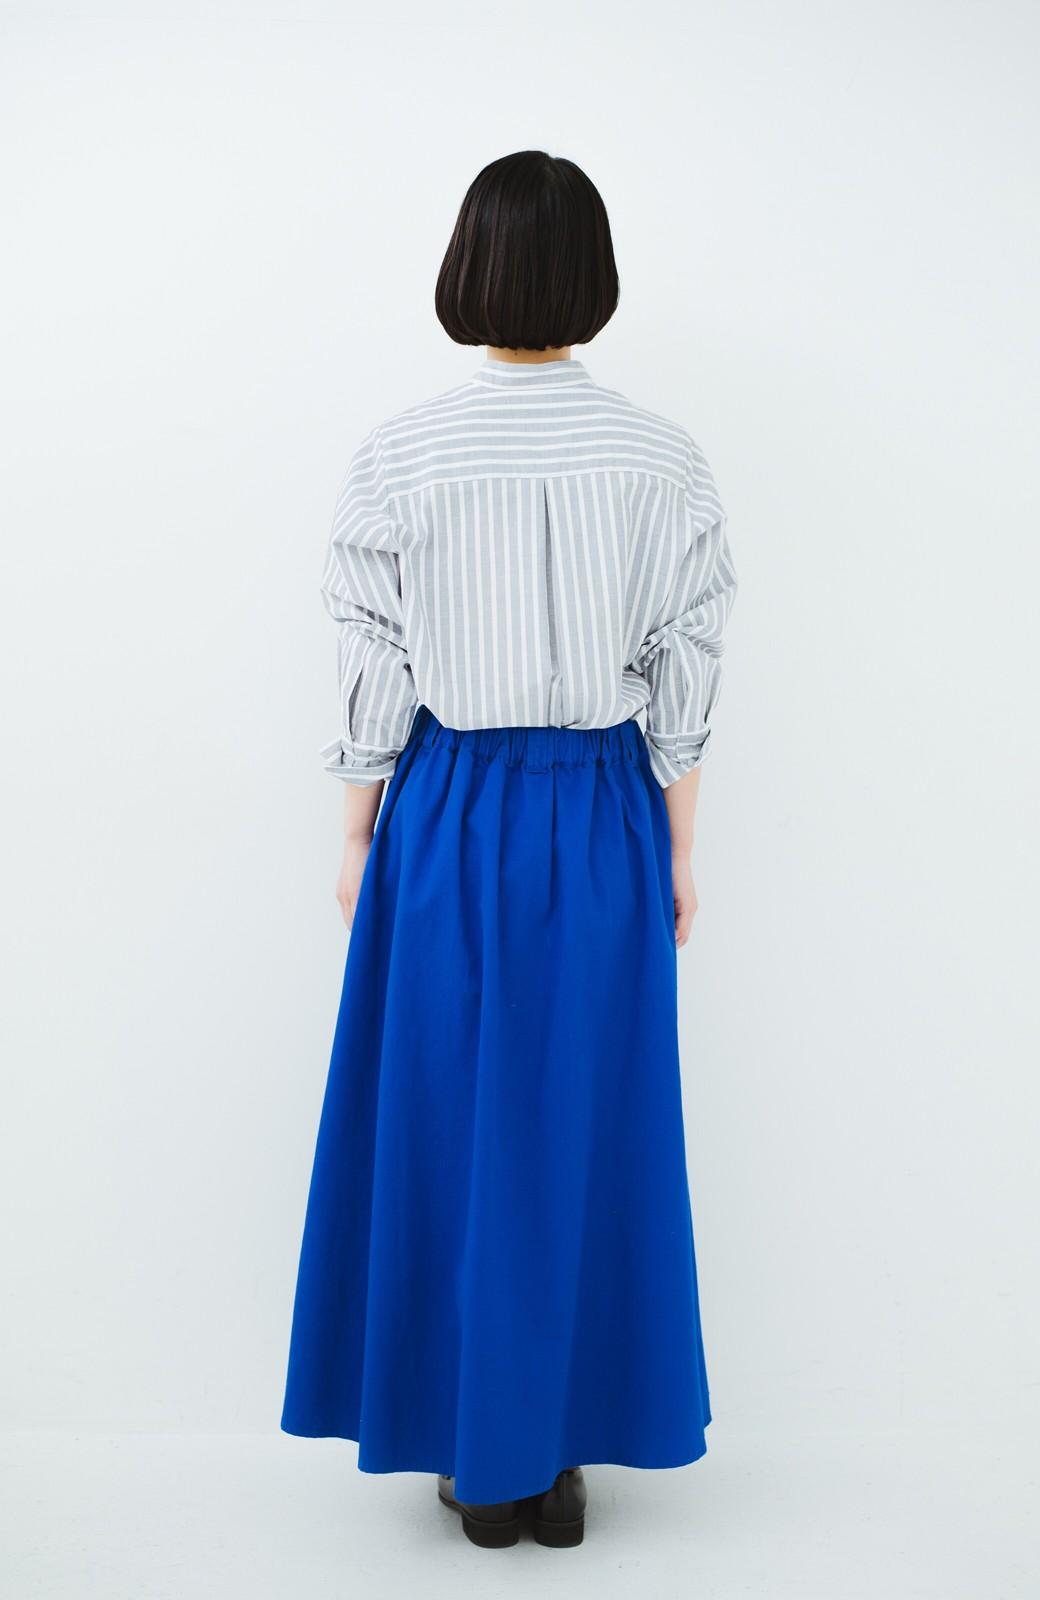 haco! 【今年も再販!】ロングシーズン楽しめる タックボリュームのチノロングスカート <ブルー>の商品写真17